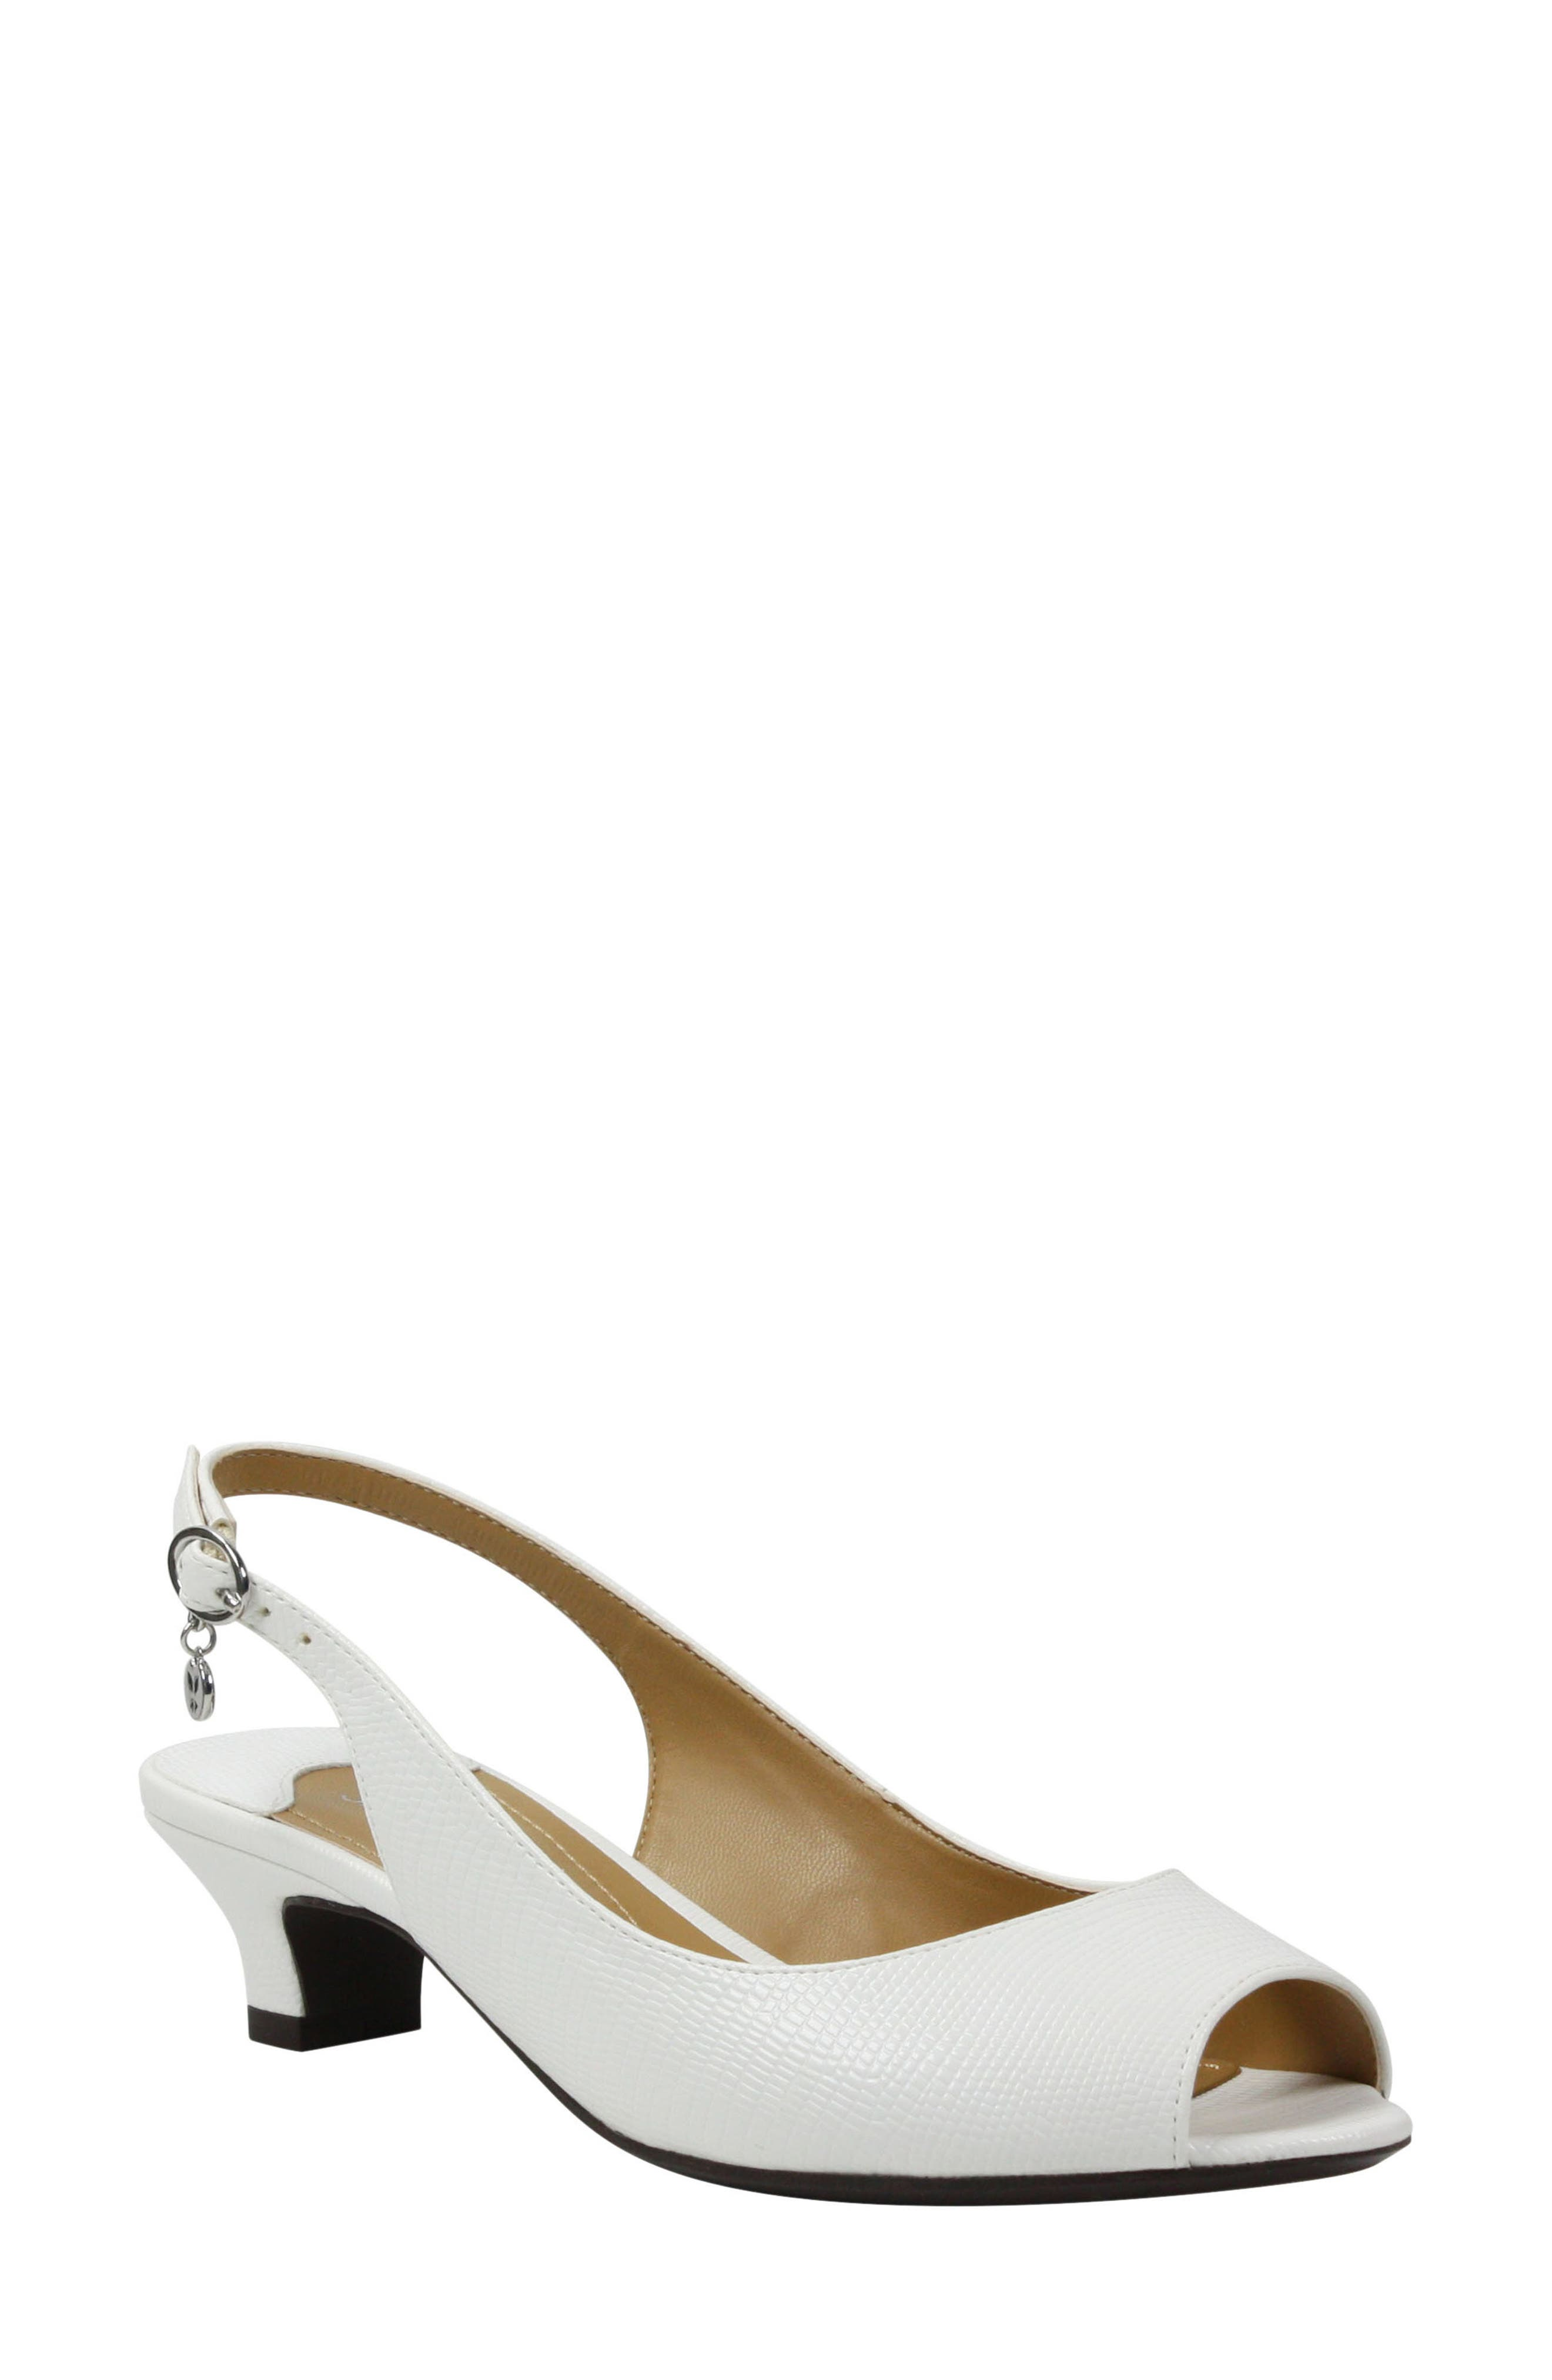 Jenvey Slingback Sandal, Main, color, WHITE LIZARD PRINT